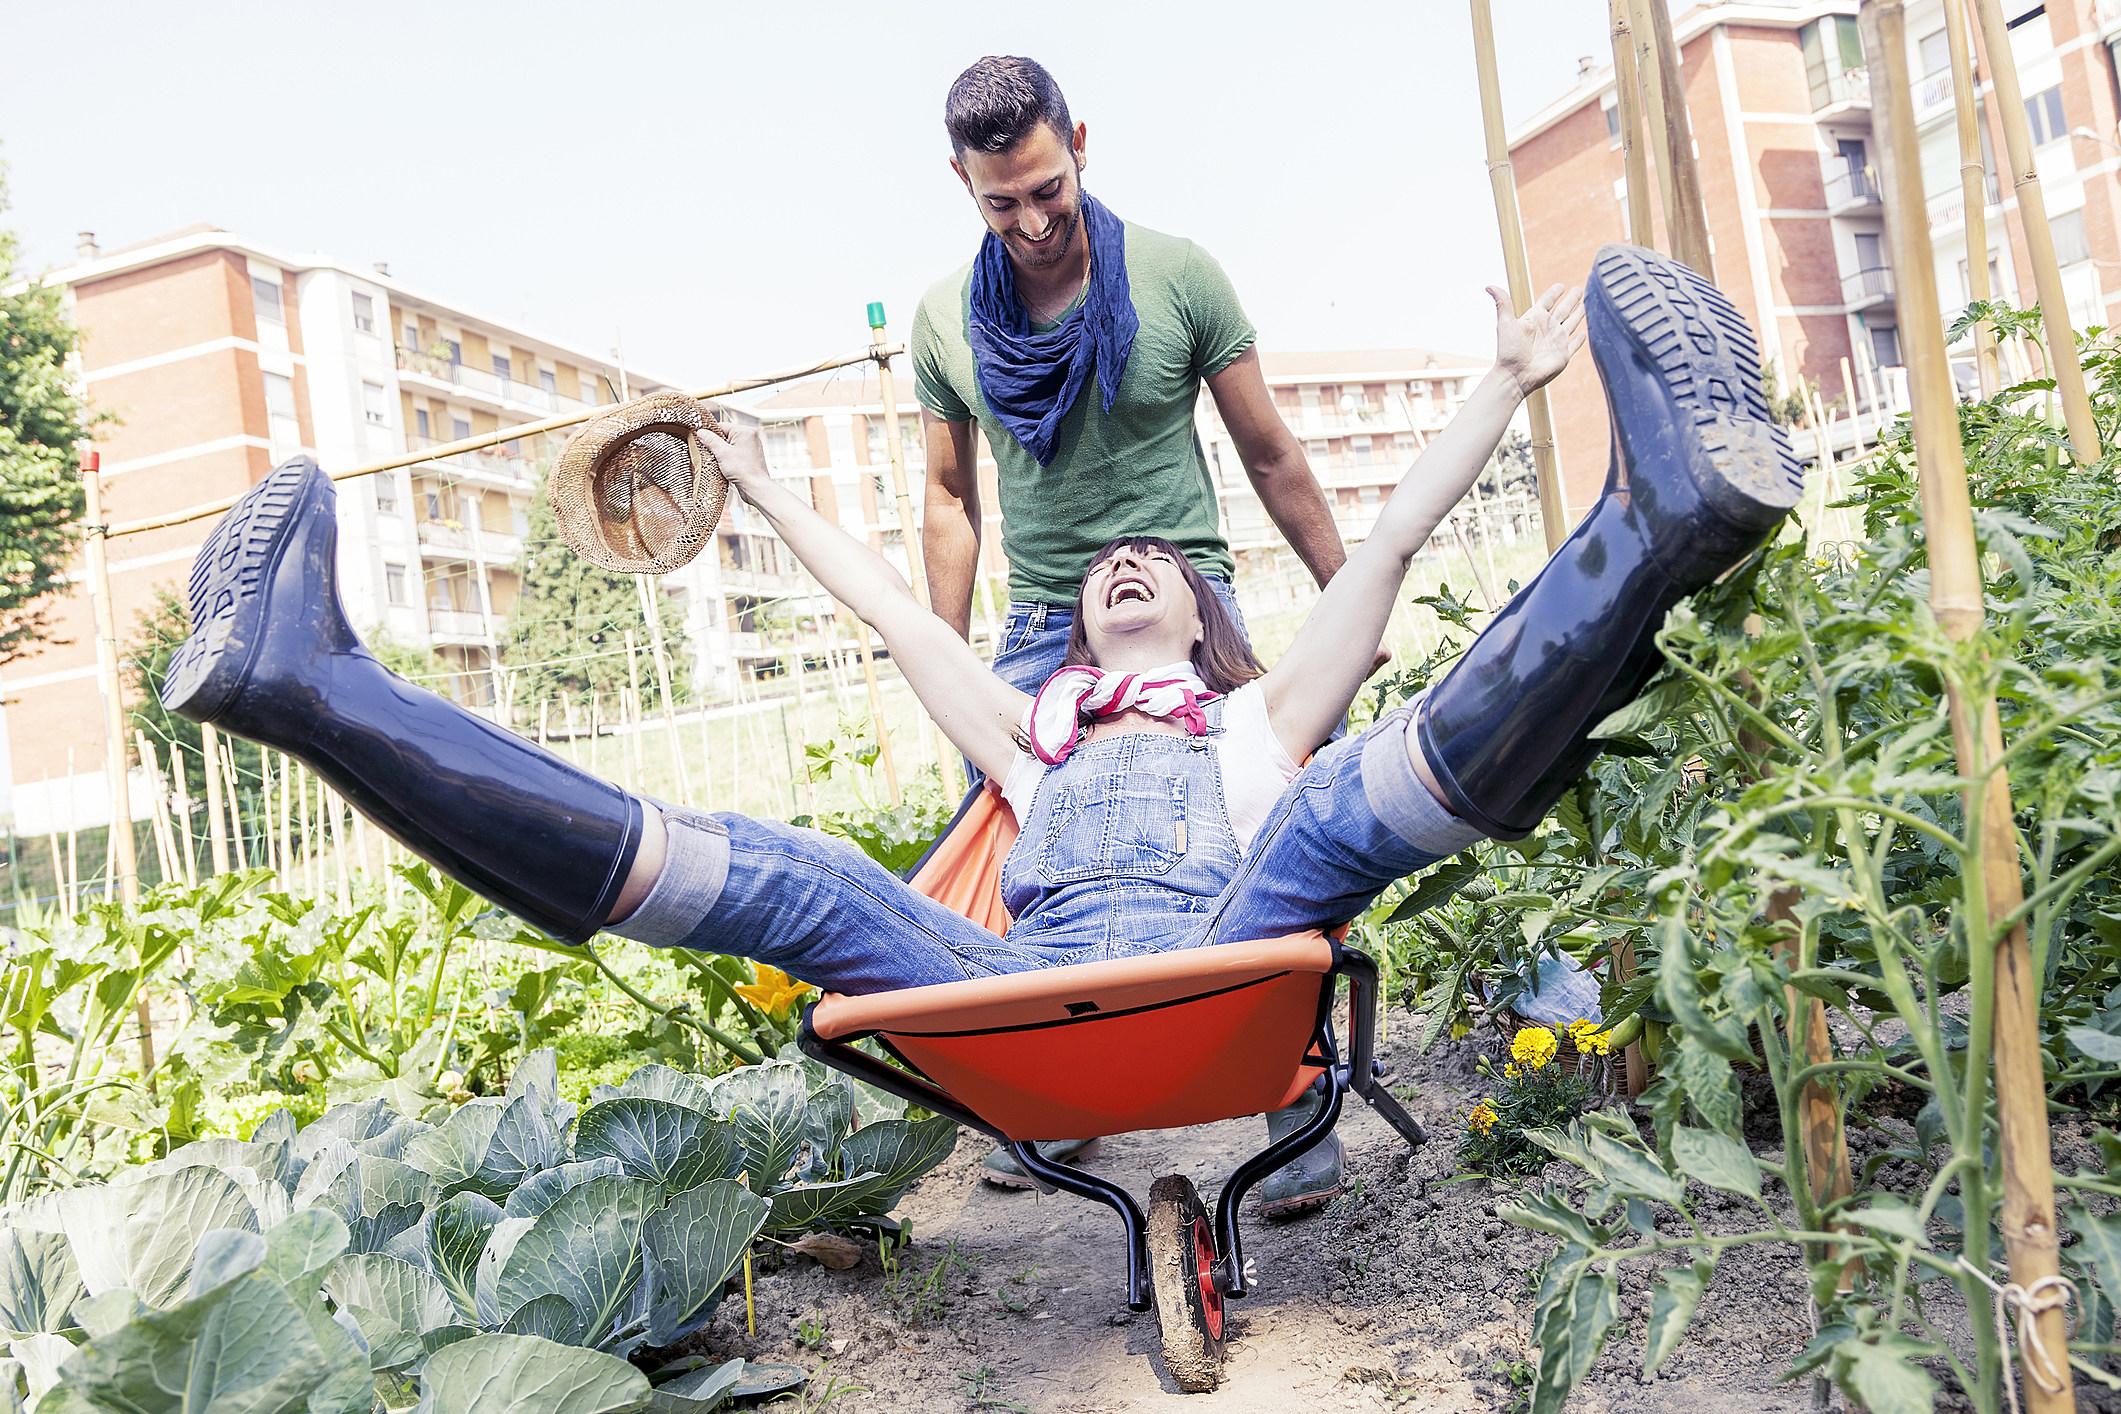 man pushes his girlfriend in wheelbarrow in the garden